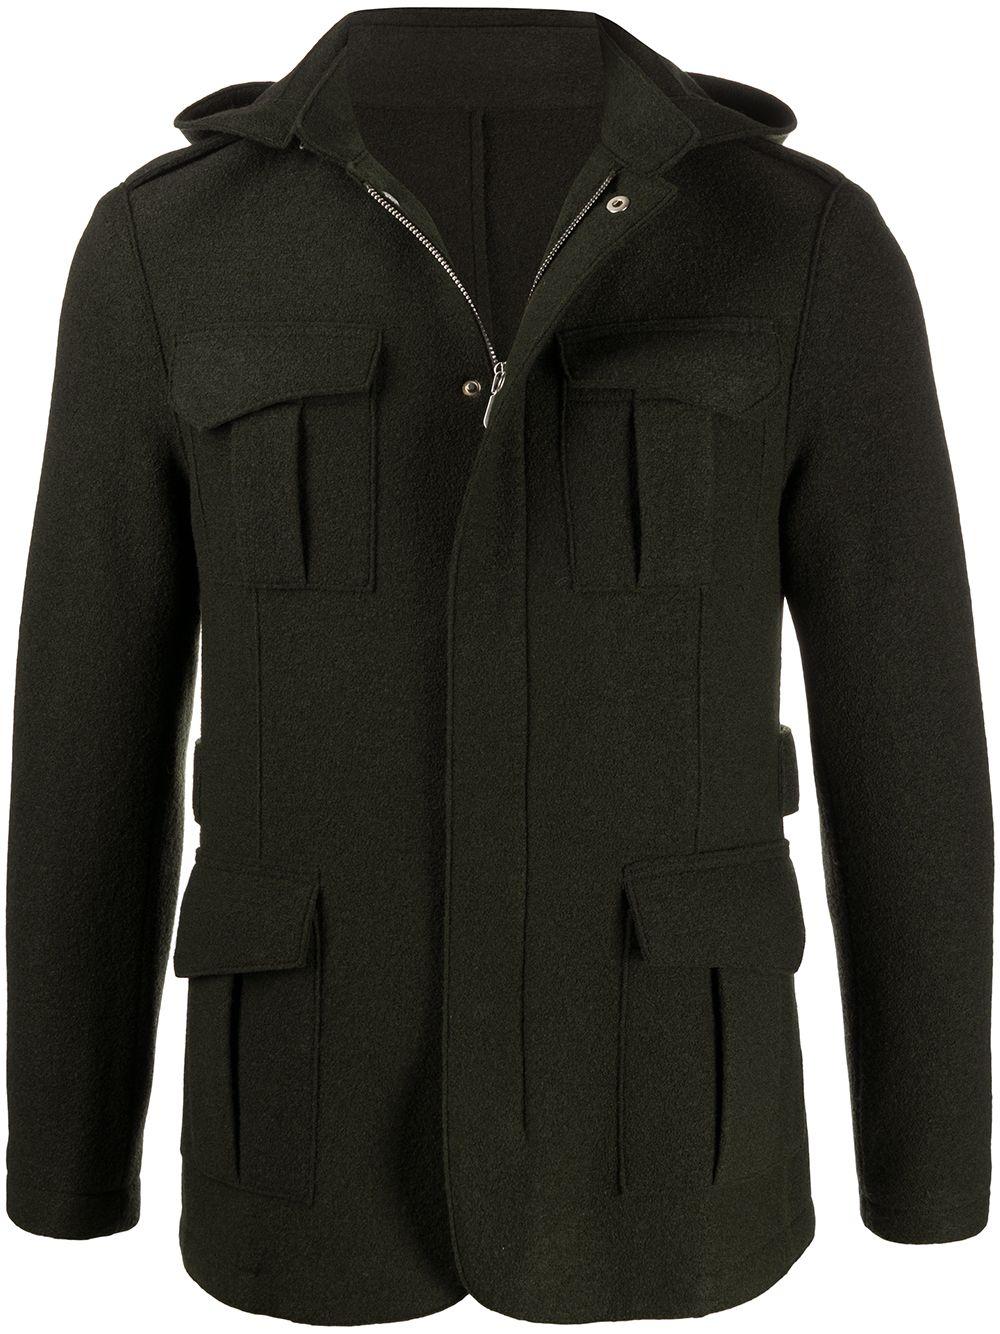 Giacca utility pocket con zip in lana vergine verde militare ELEVENTY | Giacche | B70GIAB02-CAS2400420